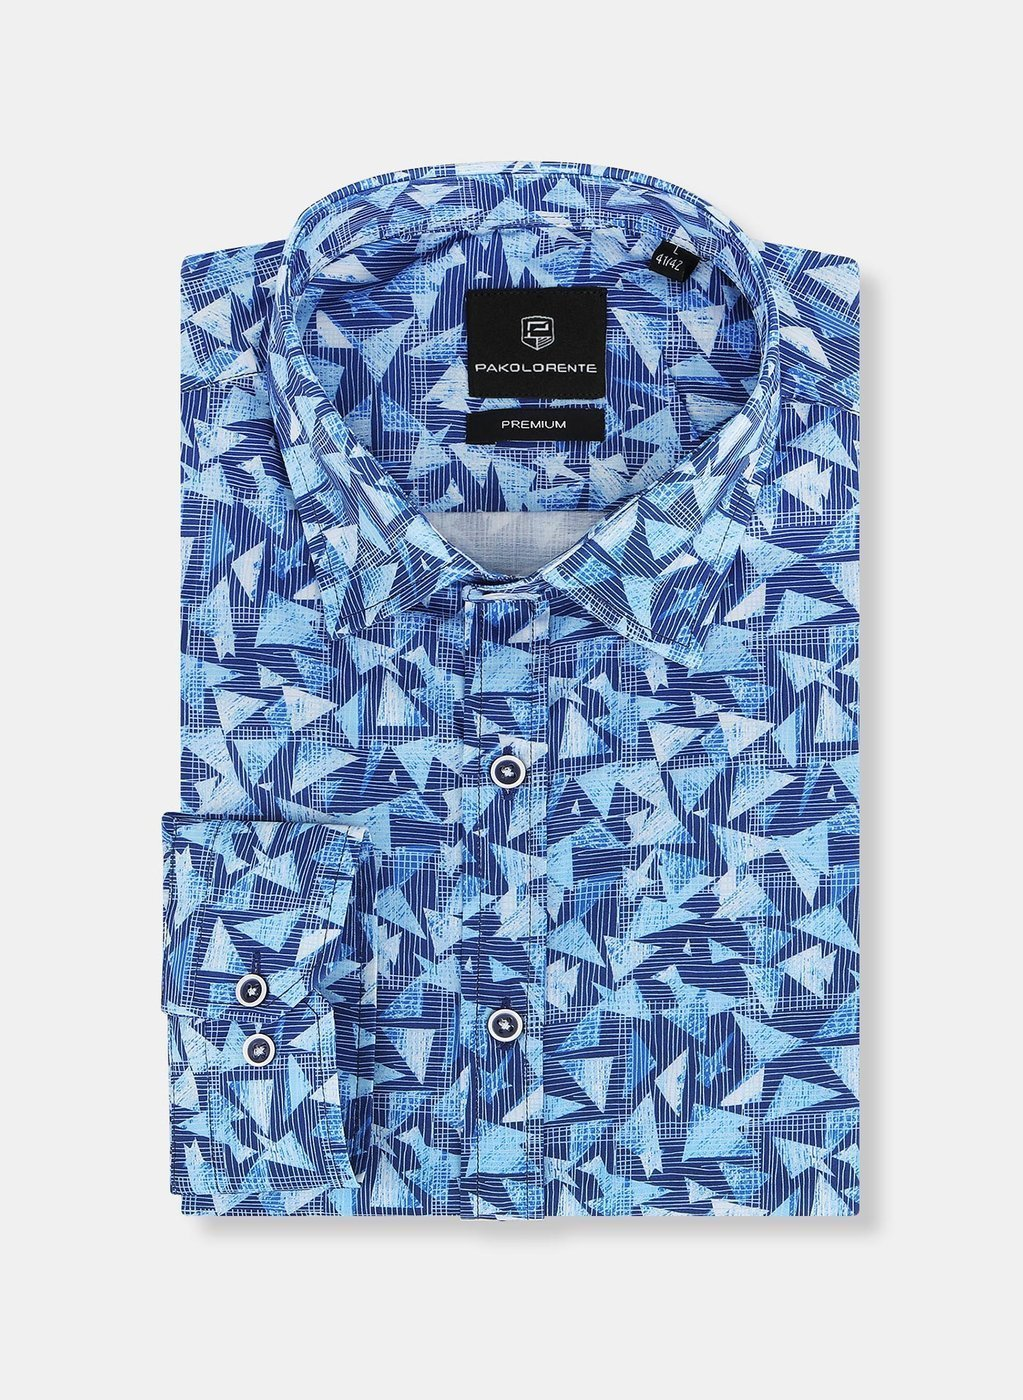 Koszula męska niebieska z nadrukiem liści